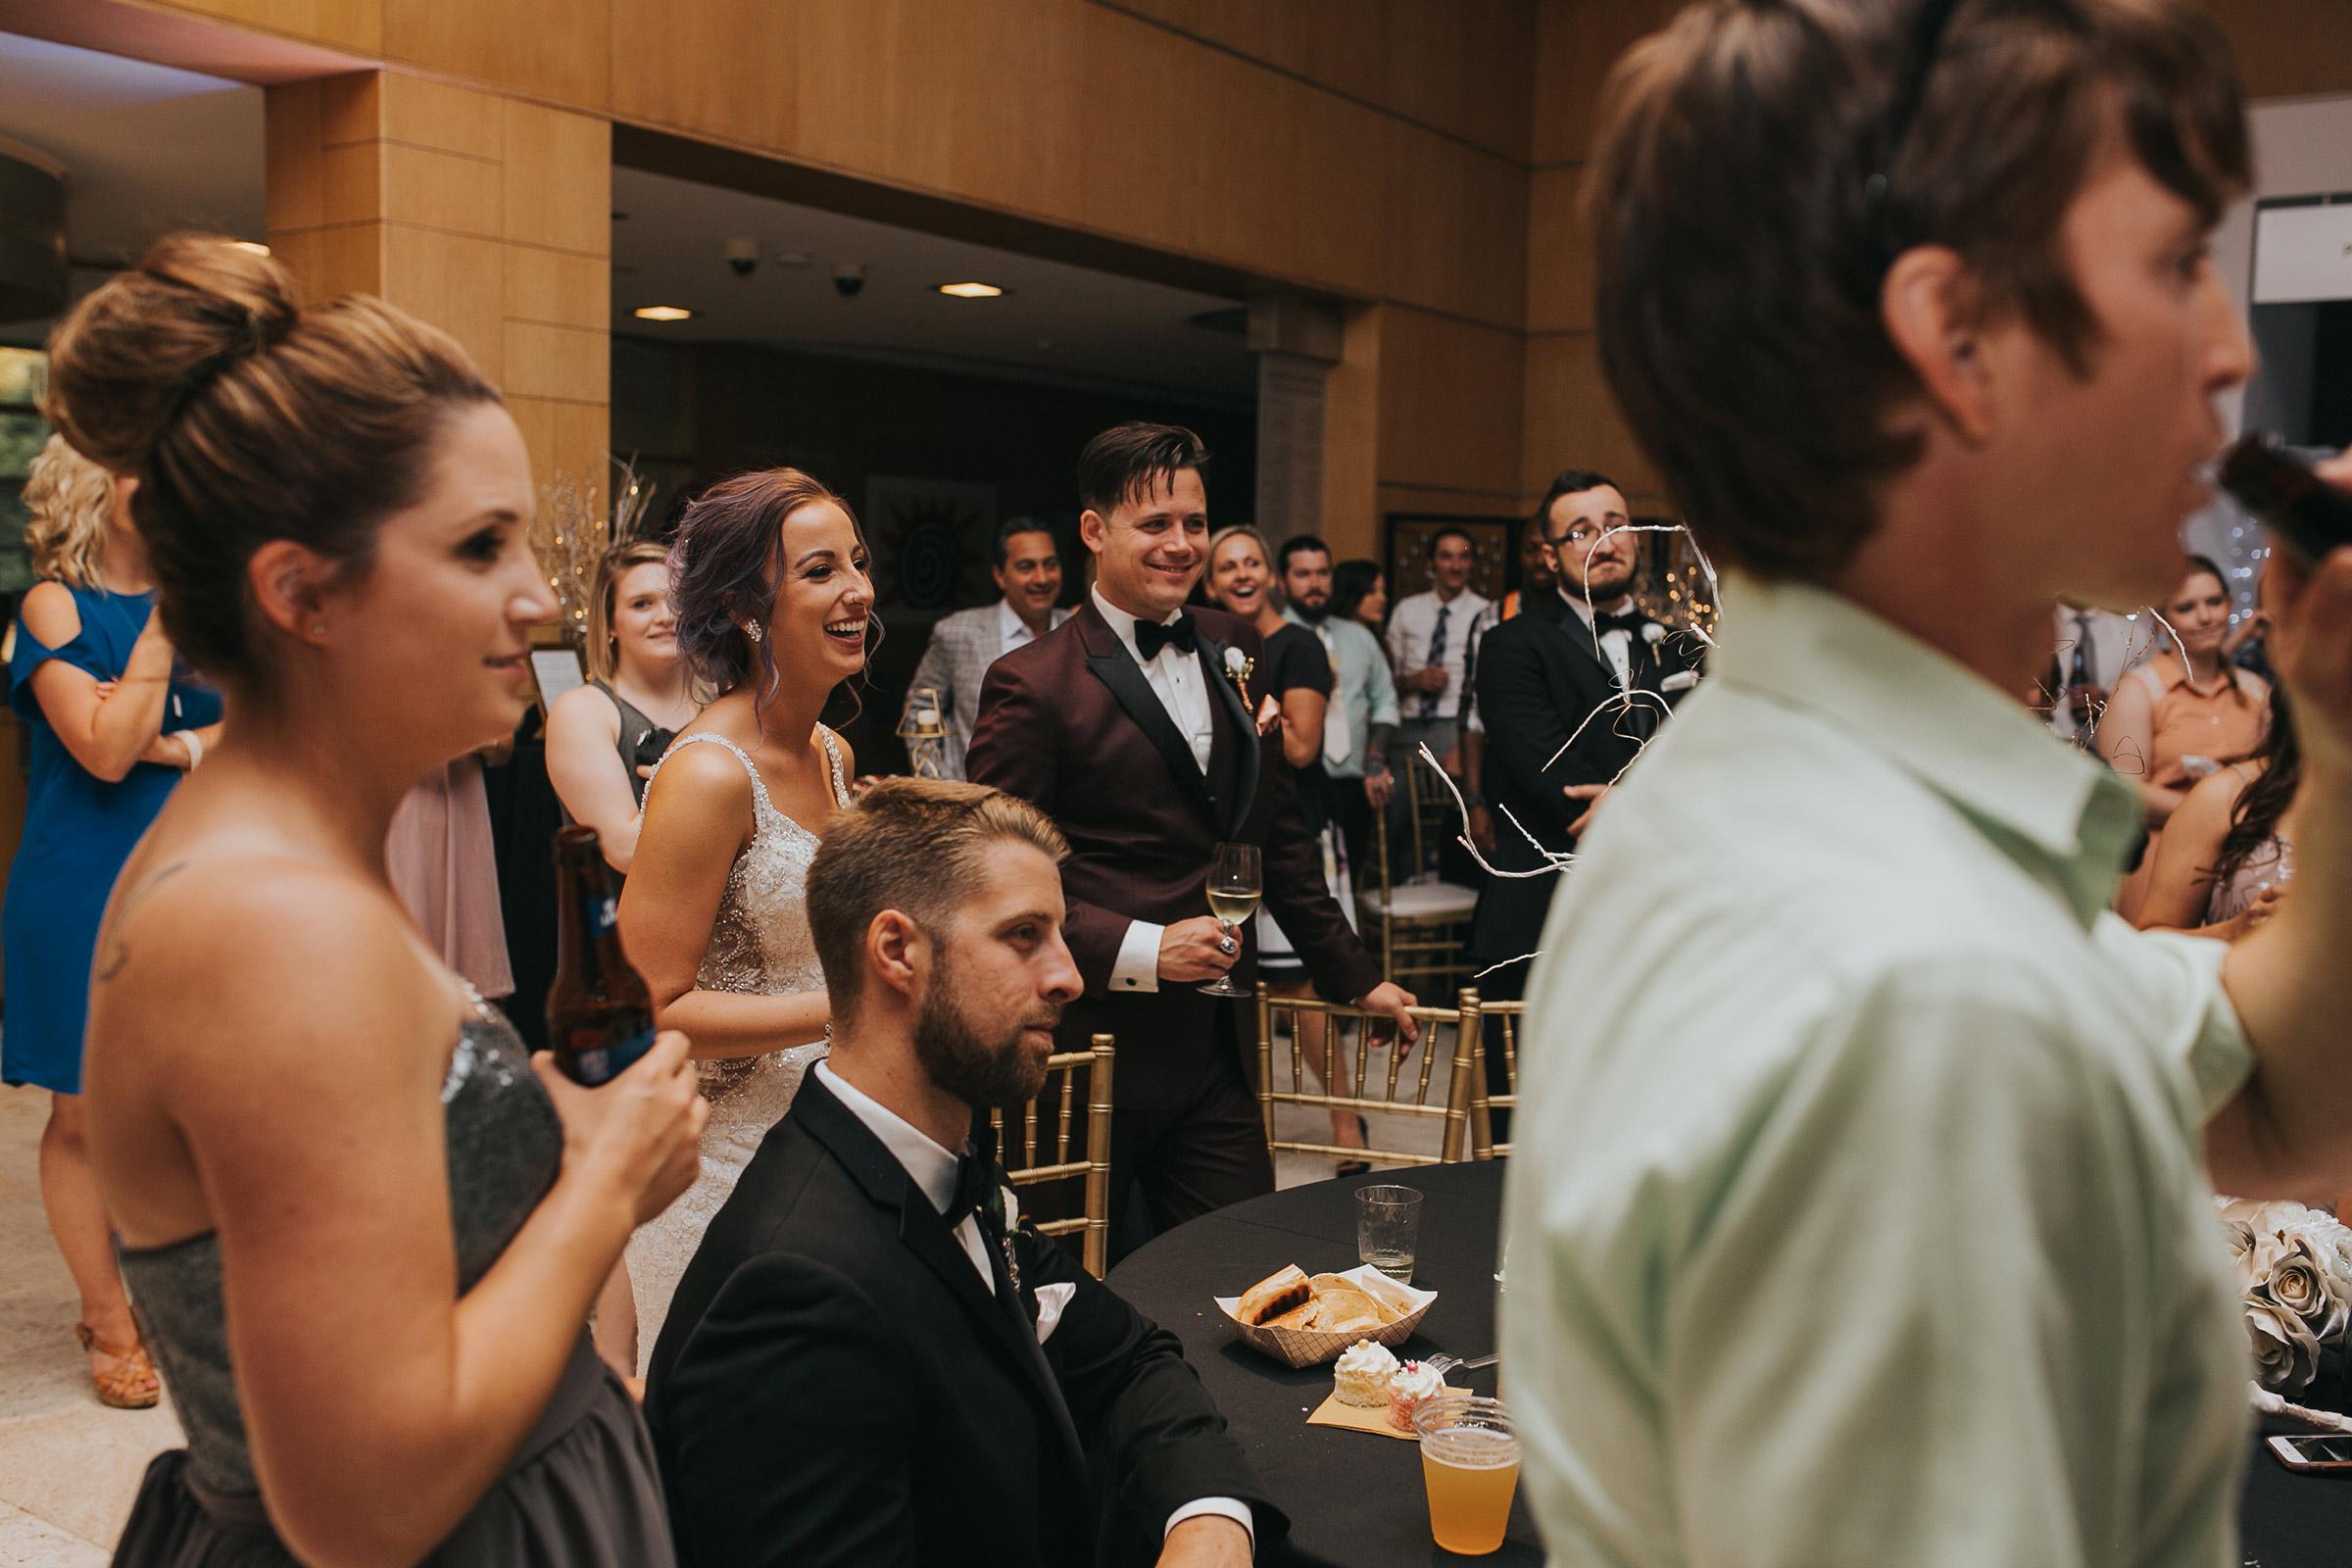 bride-laughing-at-bridesmaid-speech-desmoines-iowa-art-center-raelyn-ramey-photography.jpg